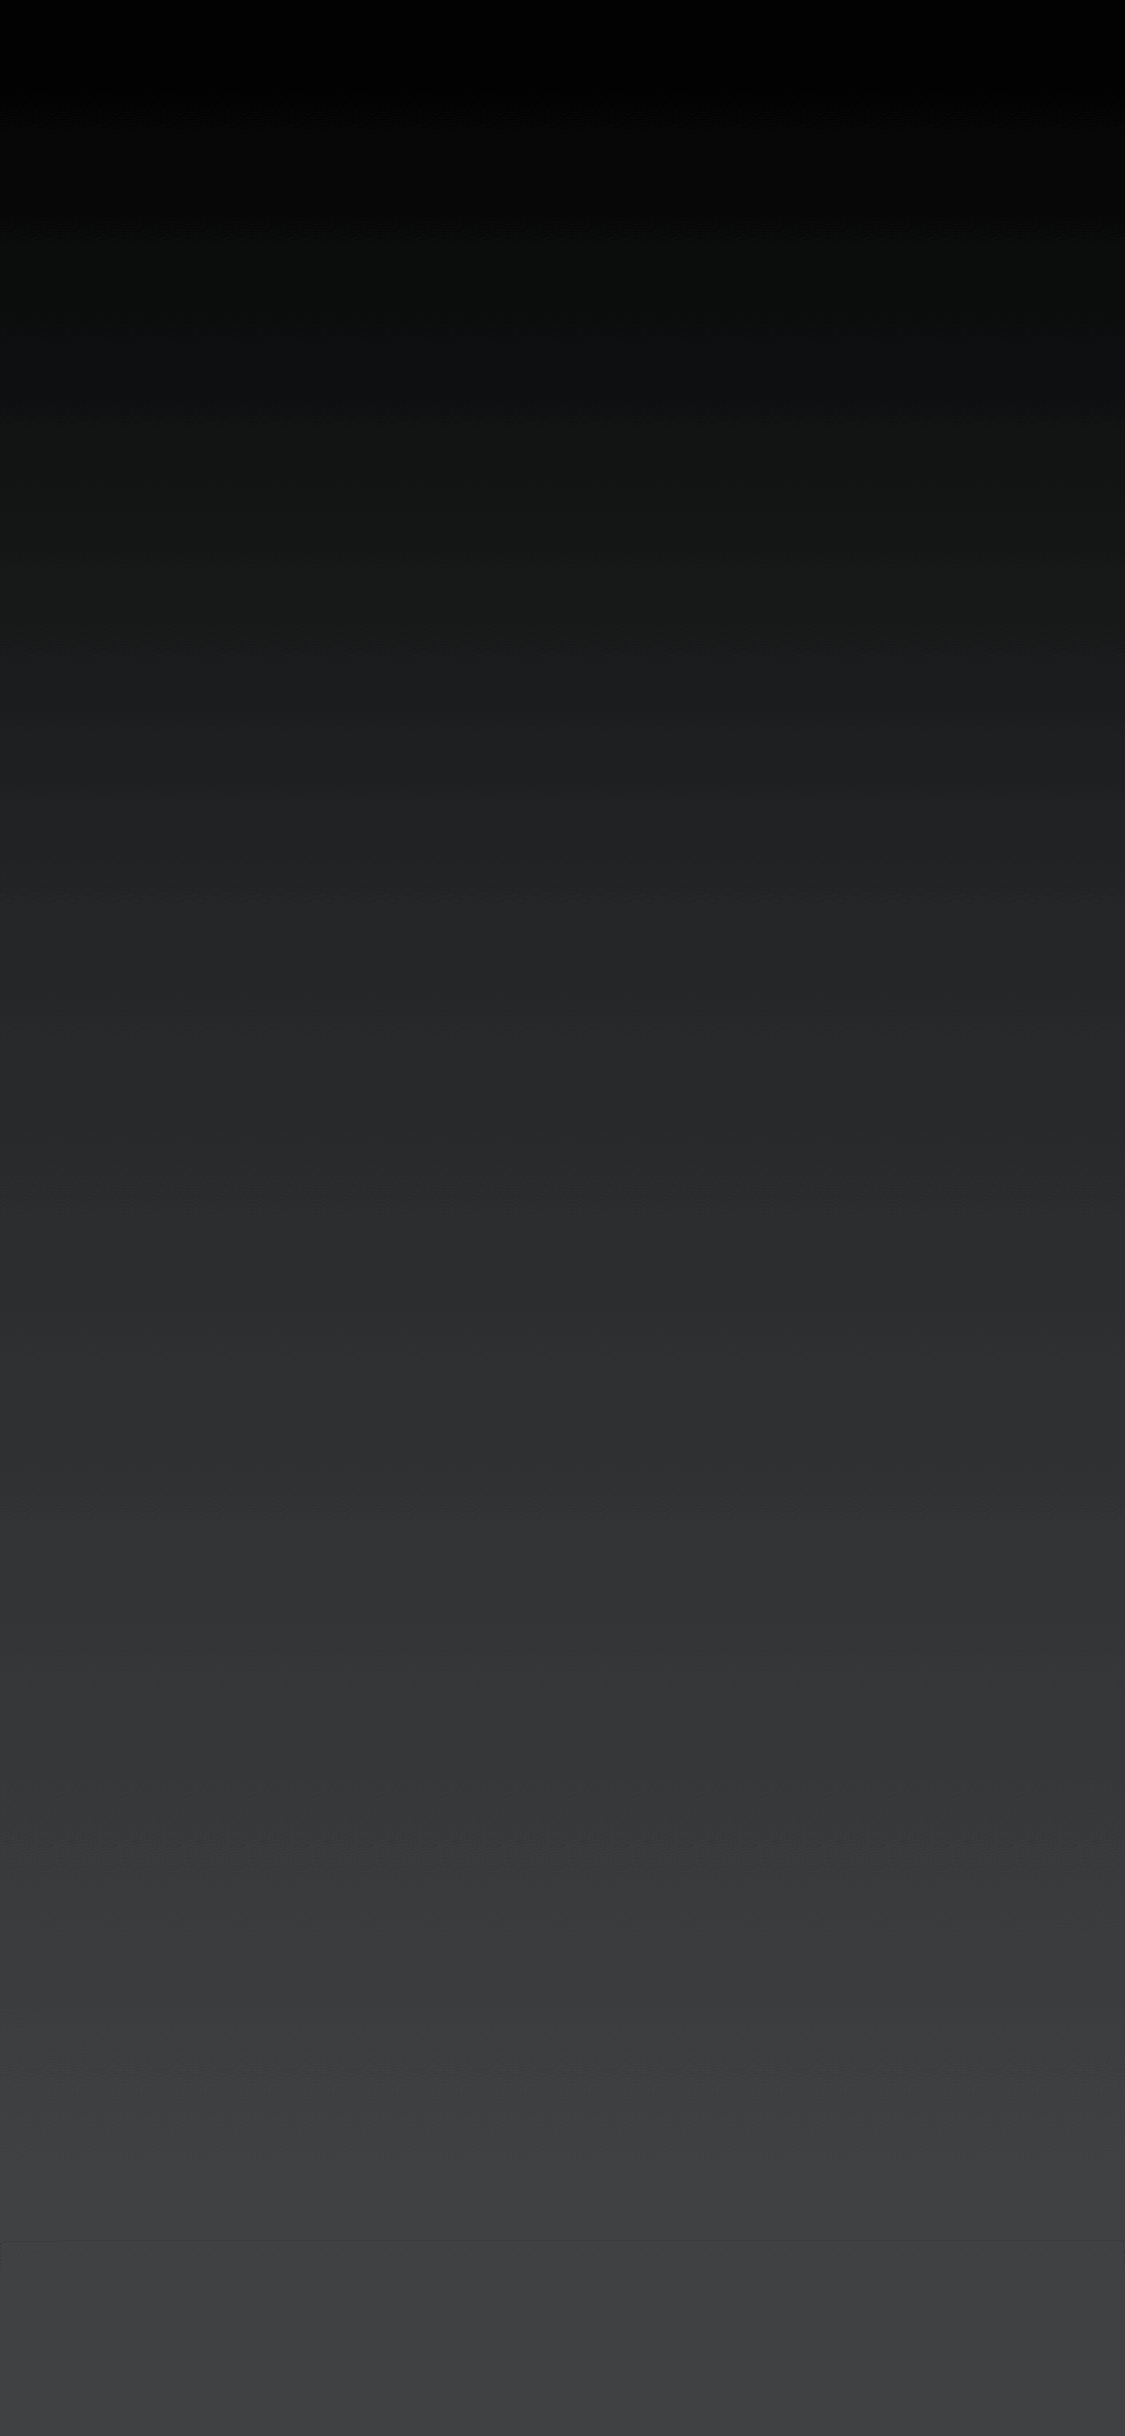 50 Fonds D Ecran Iphone X Xs Xr Hd A Encoche Iphone Soft